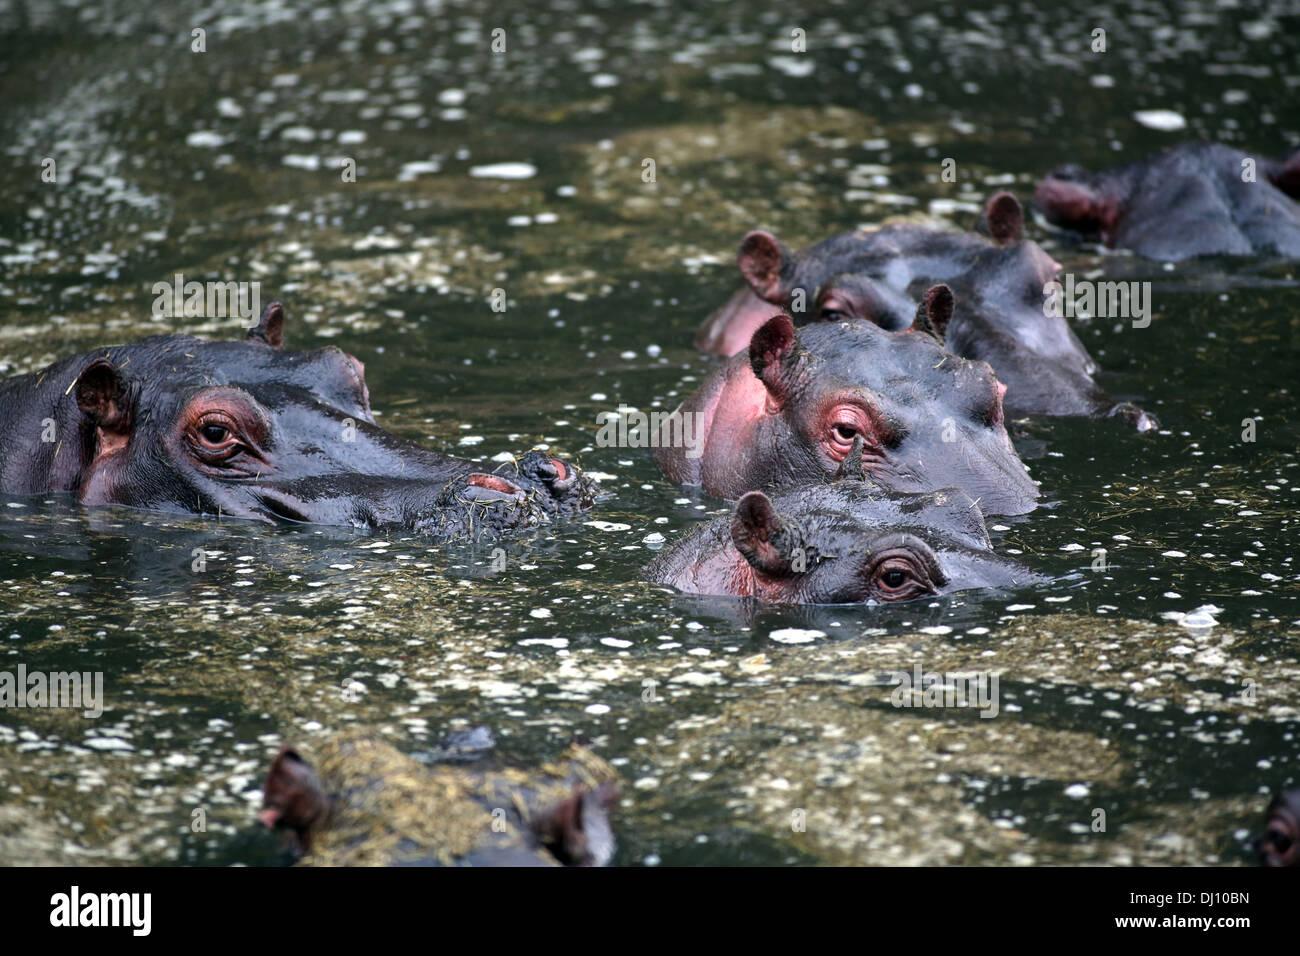 A pod of hippos (Hippopotamuses) in the water at the Maasai Mara, Kenya - Stock Image